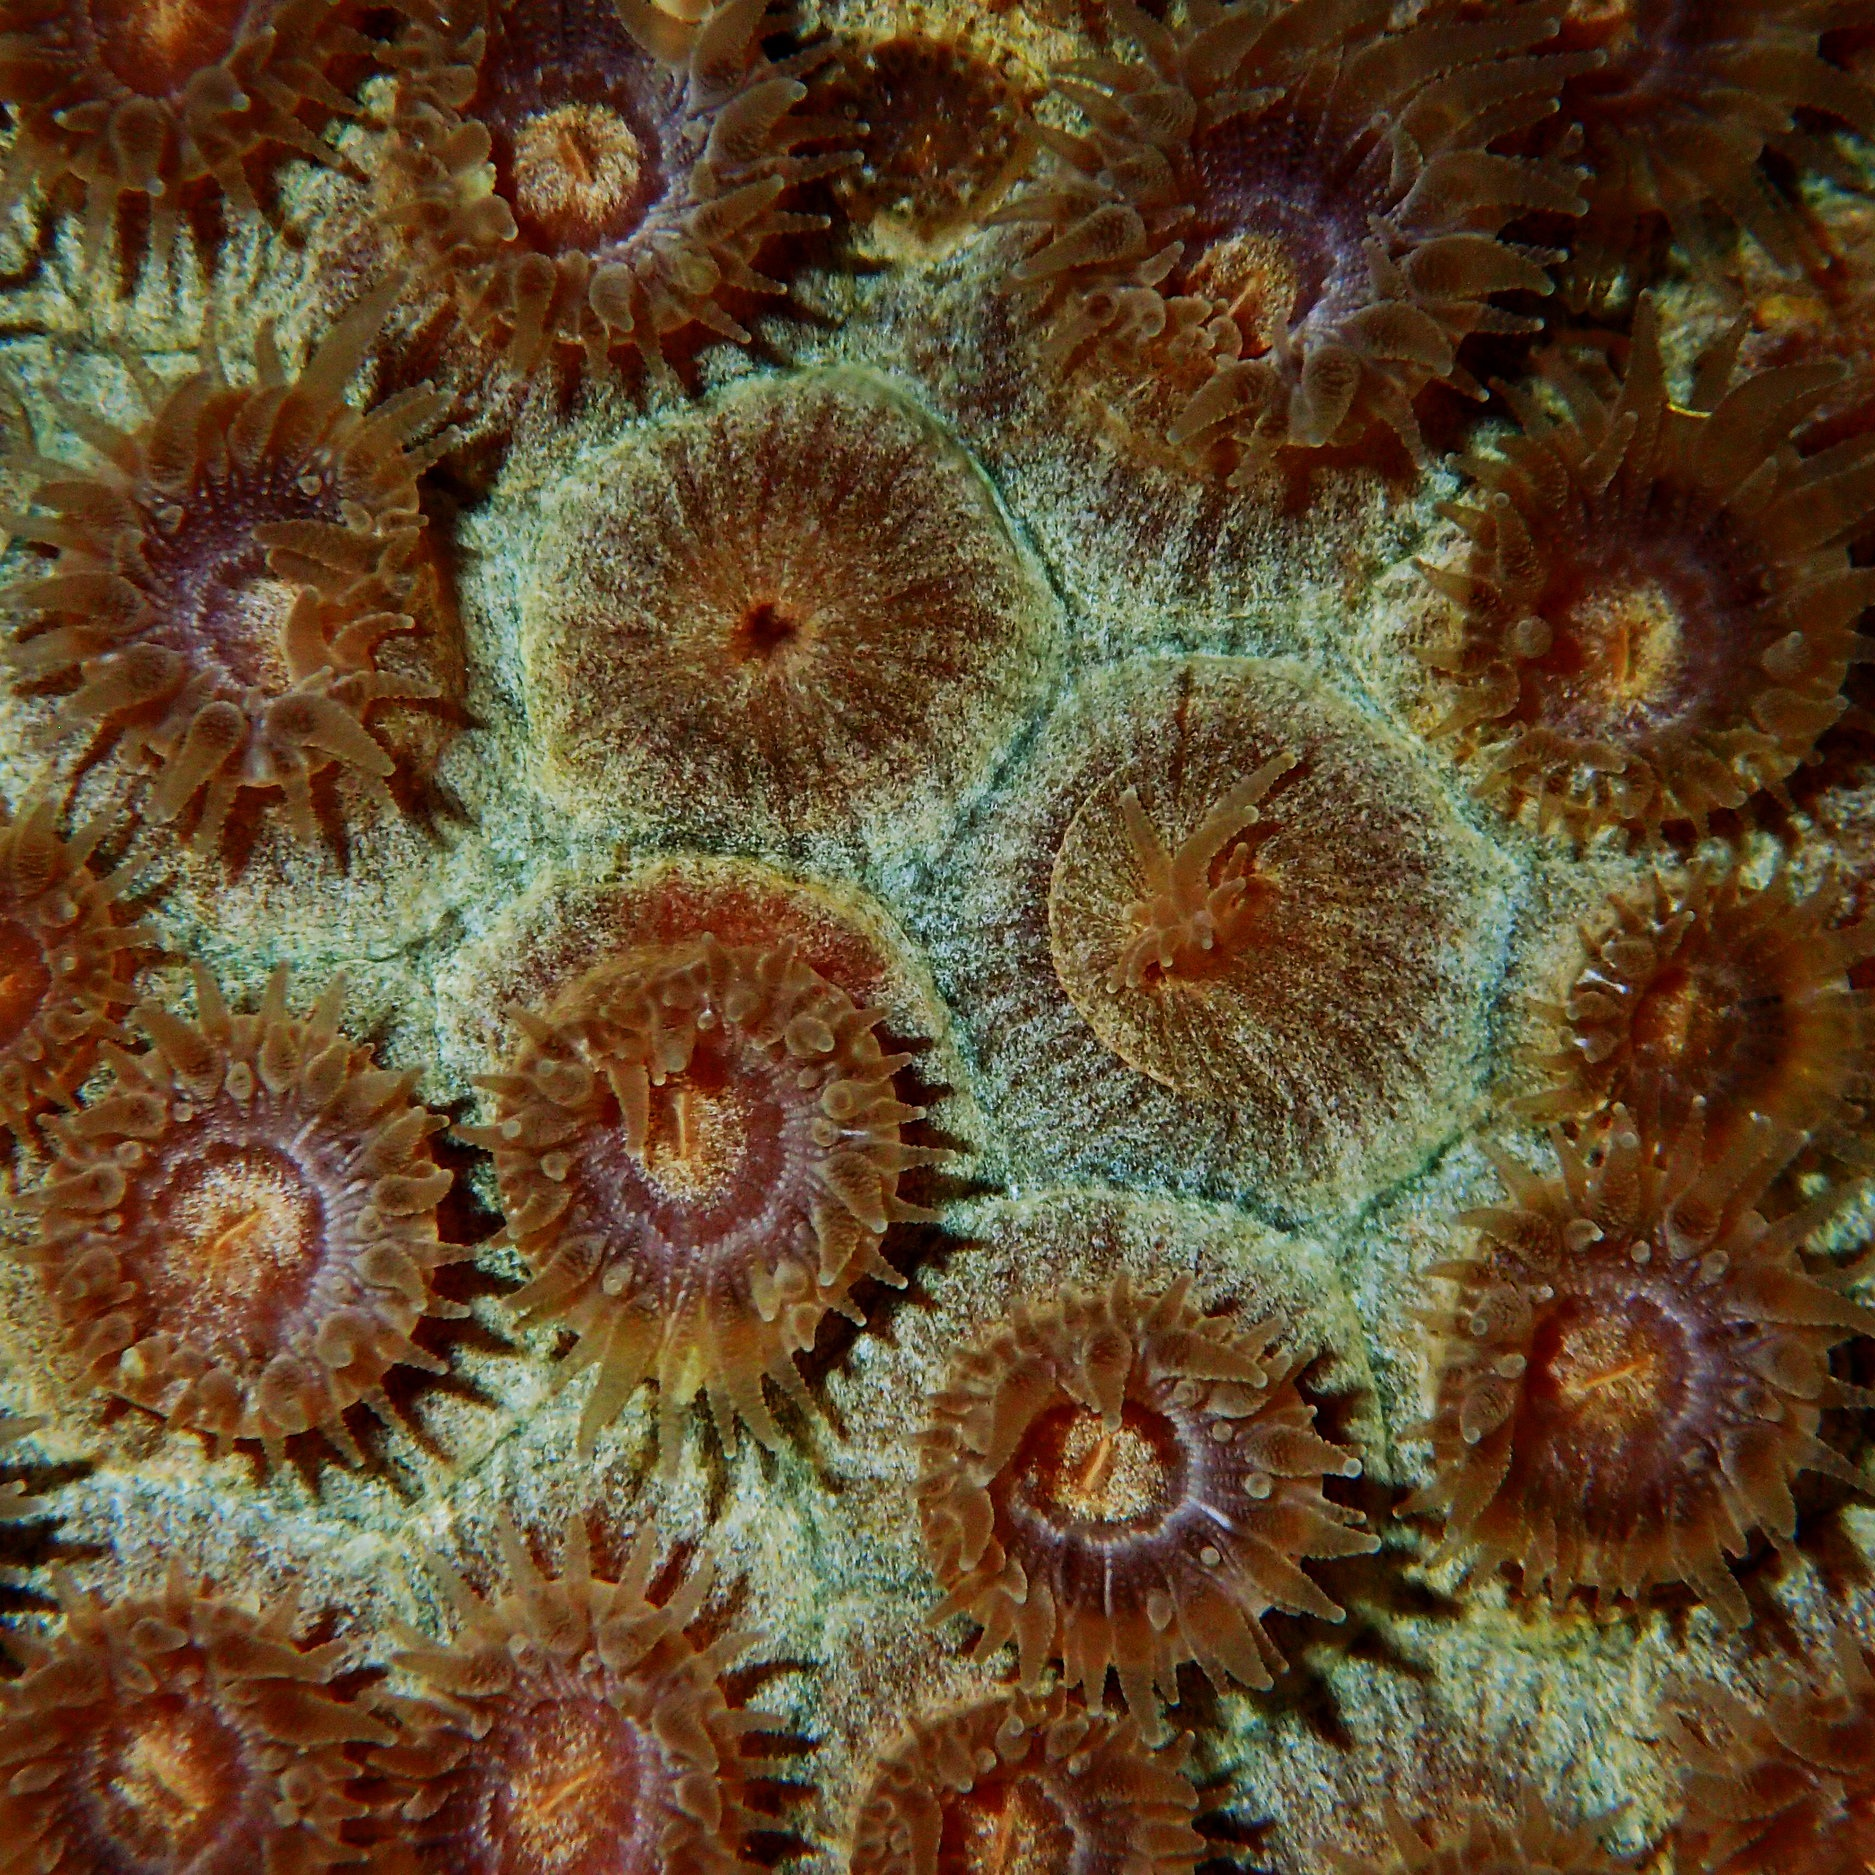 Great star coral ( Montastraea cavernosa ) polyps.